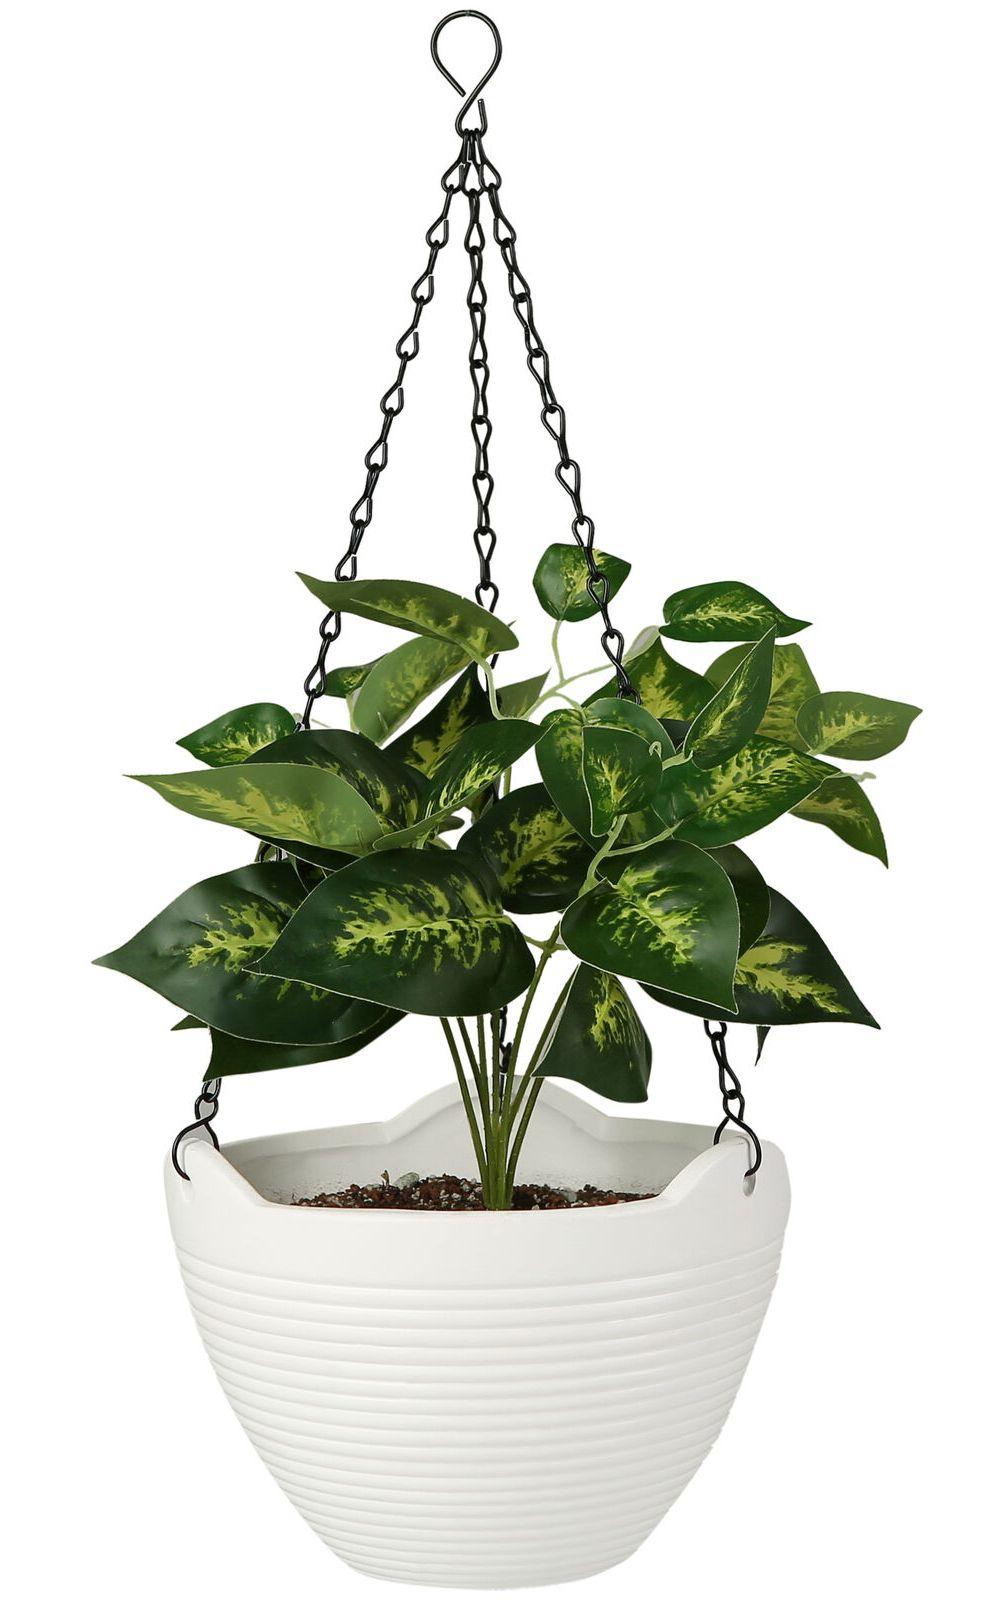 Inch Ceramic Hanging Flower Planter Pot